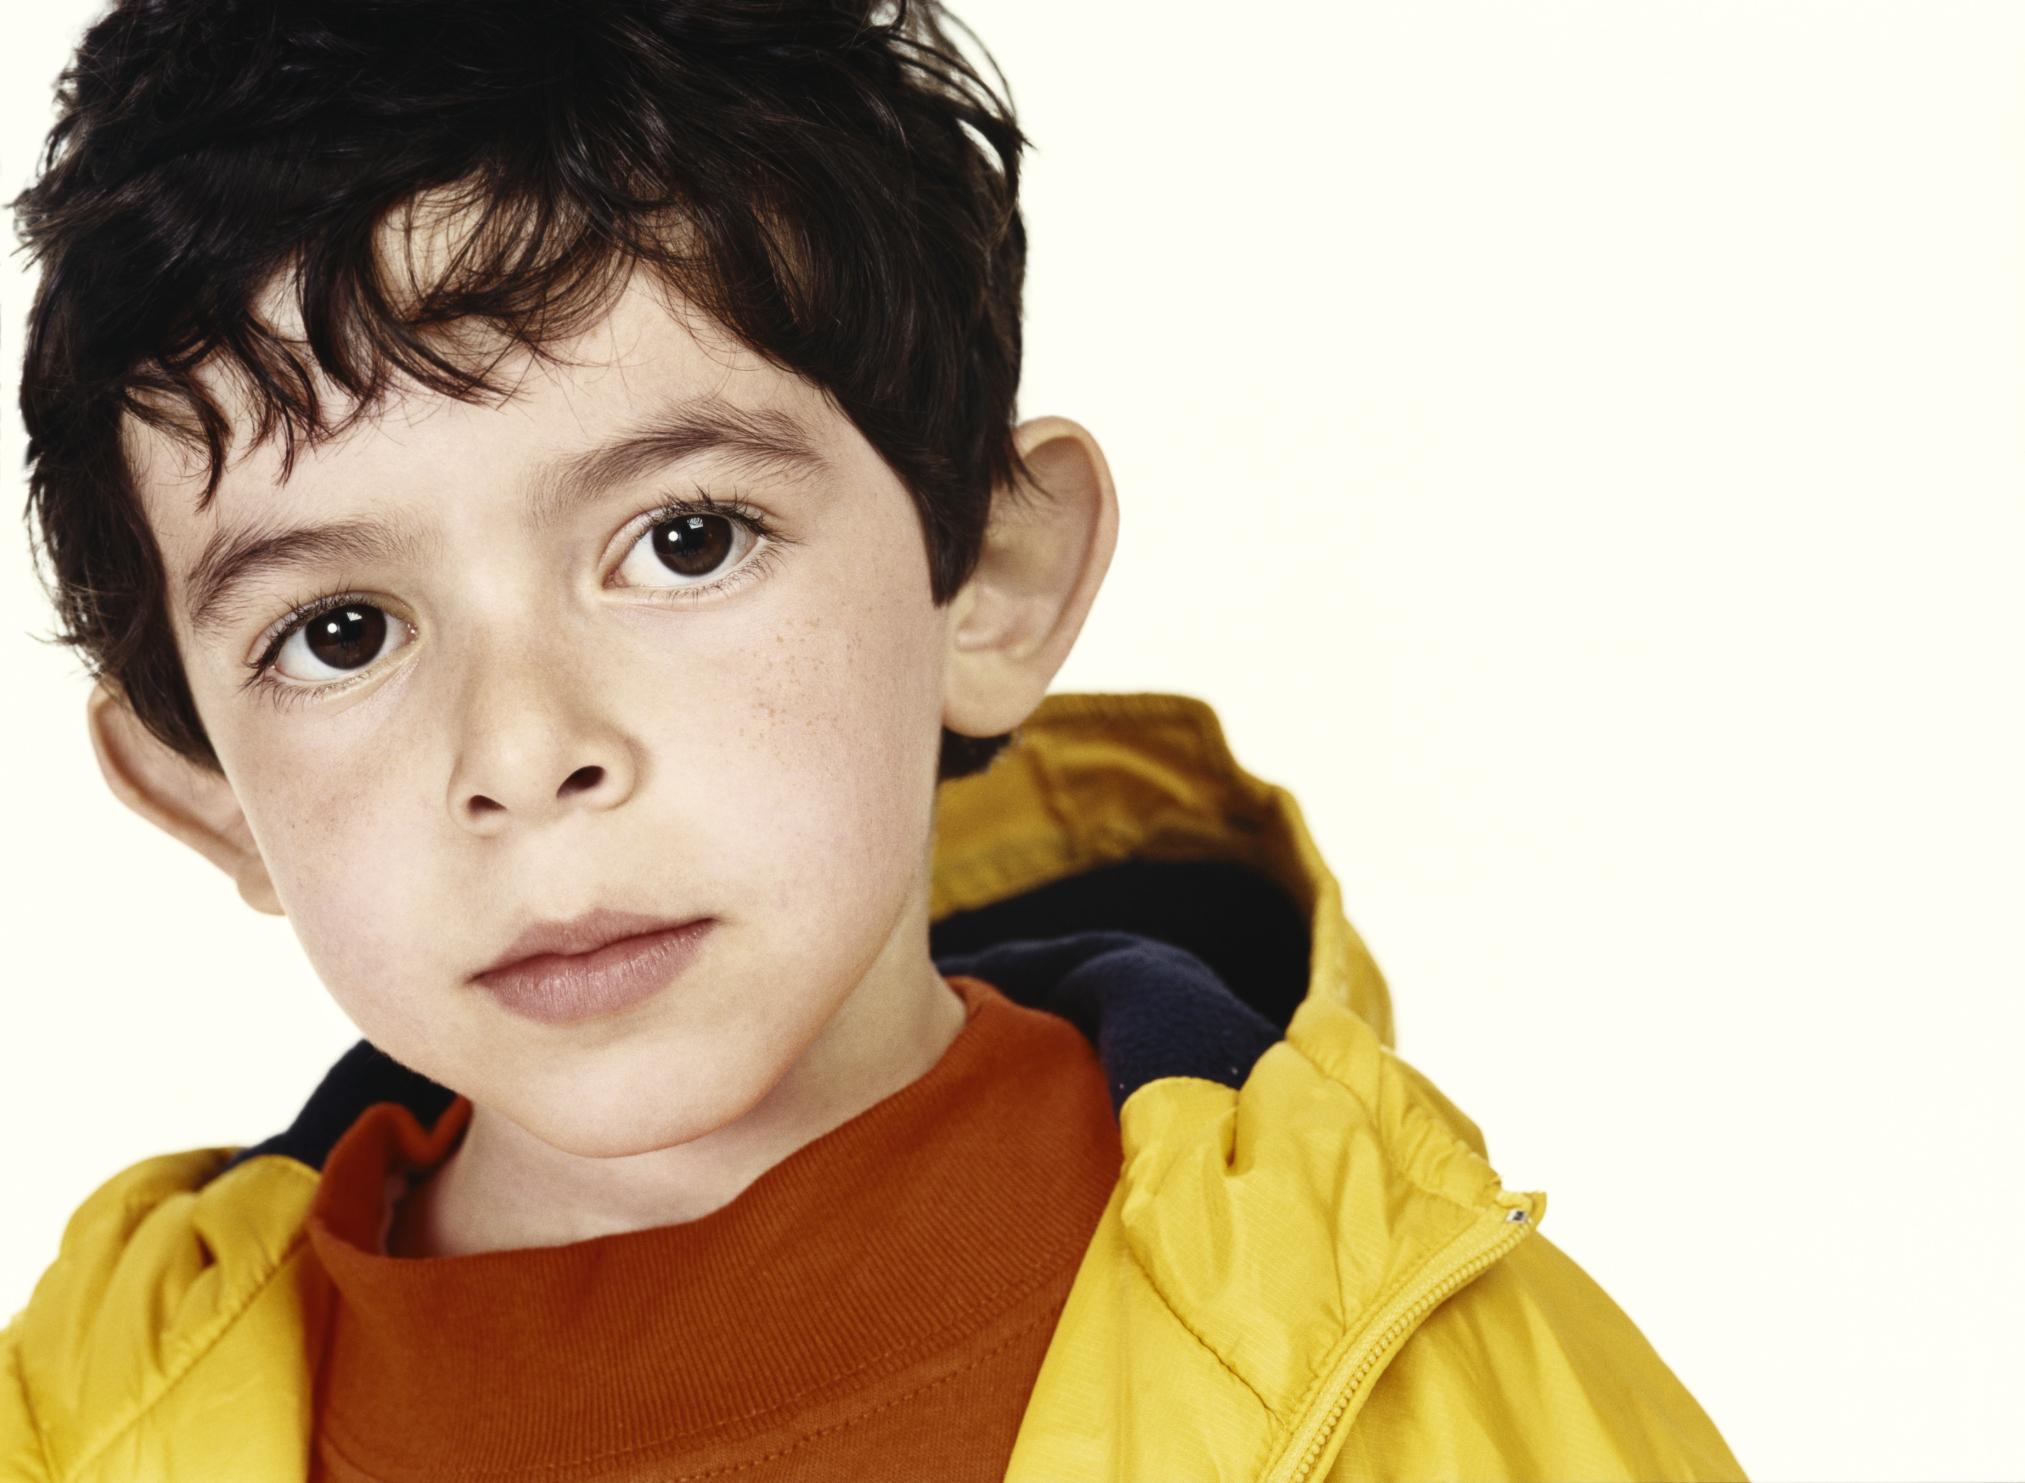 Emotional Child Abuse Symptoms